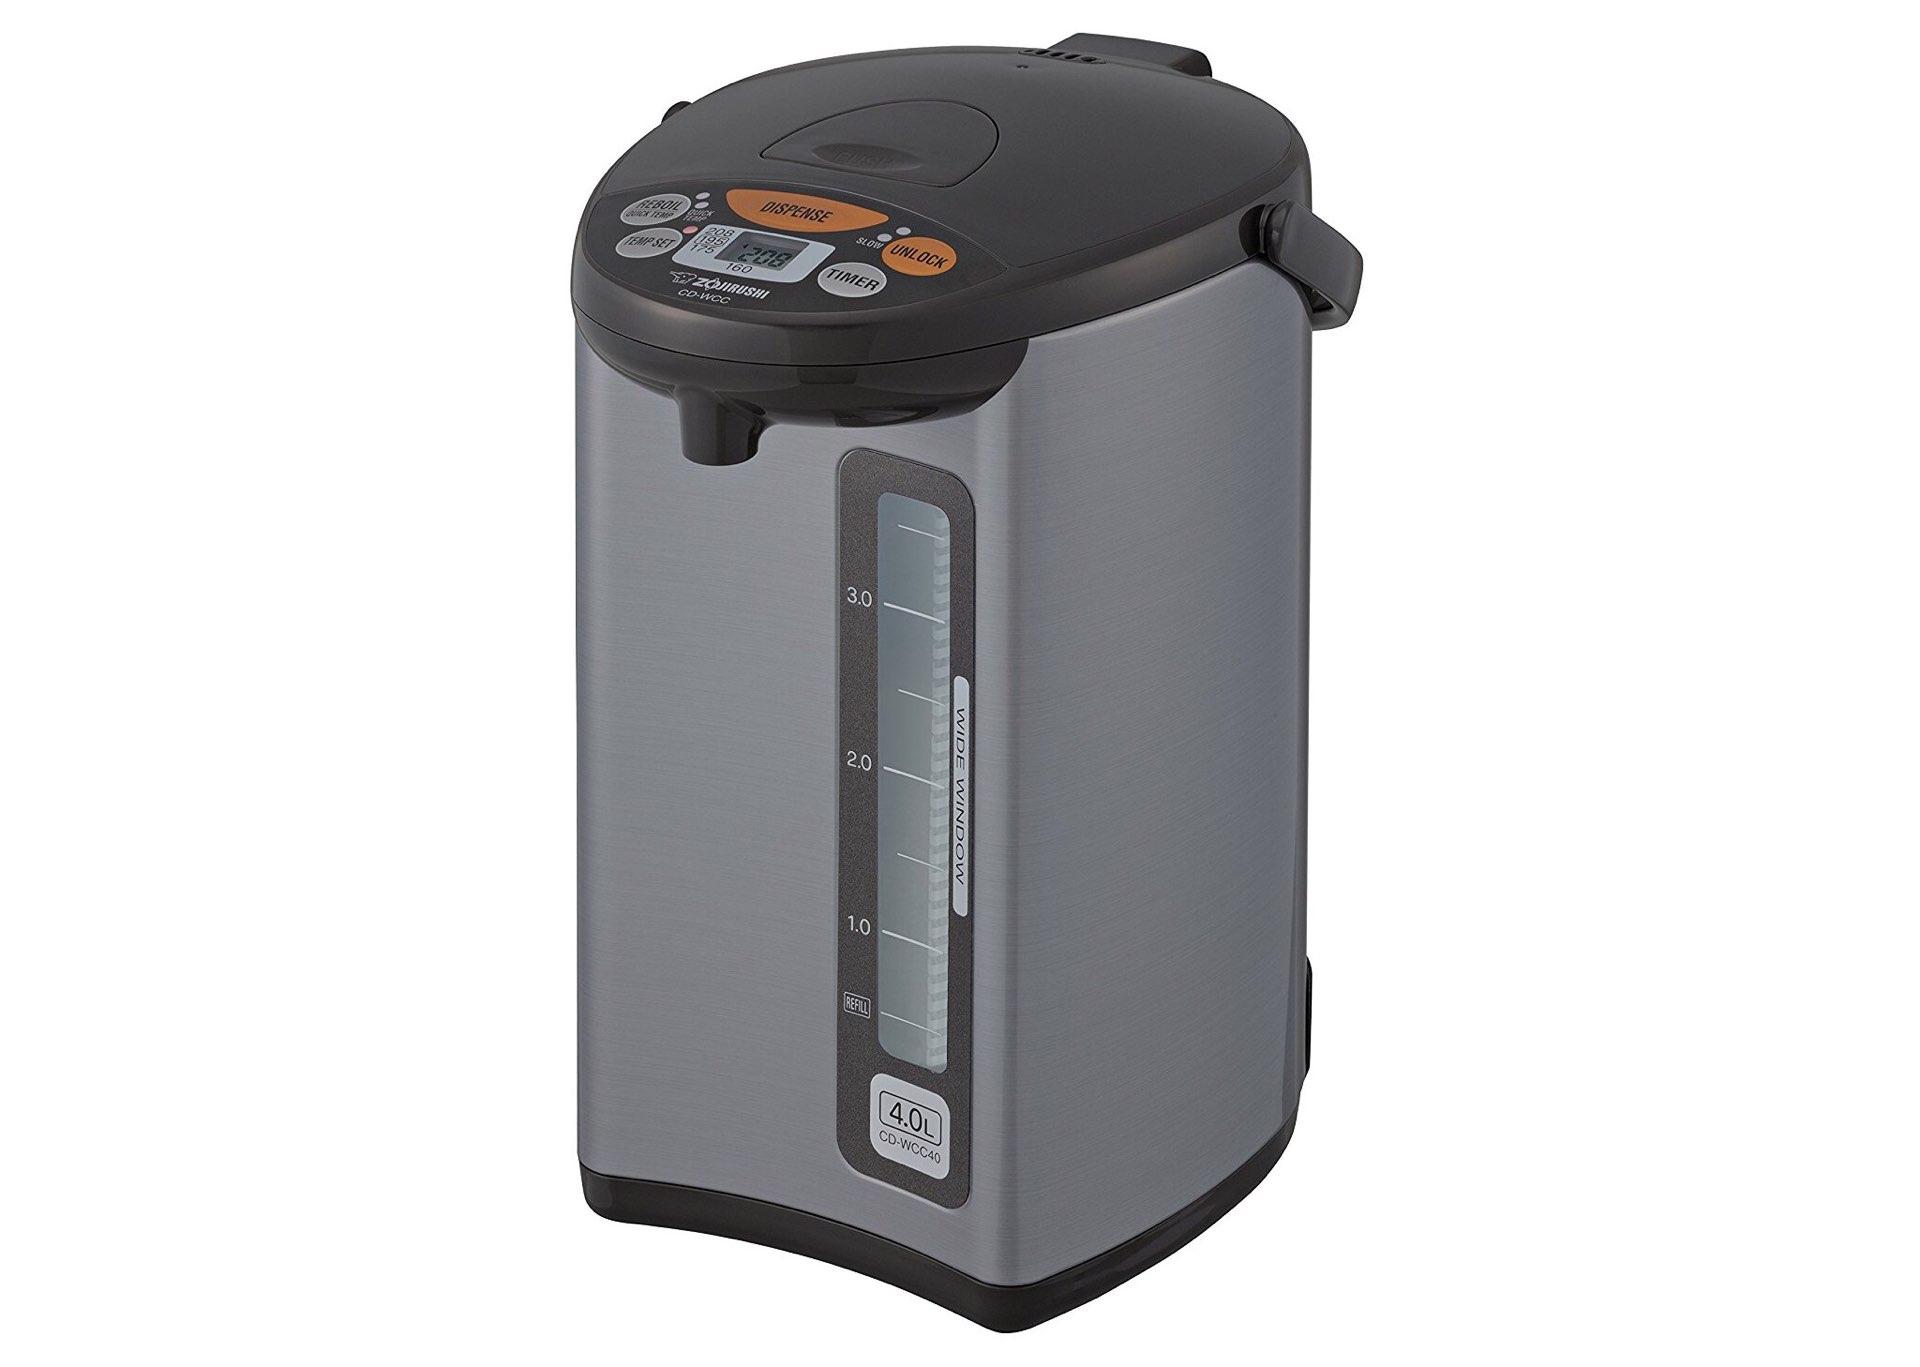 Zojirushi CD-WCC40 water boiler and warmer. ($128)